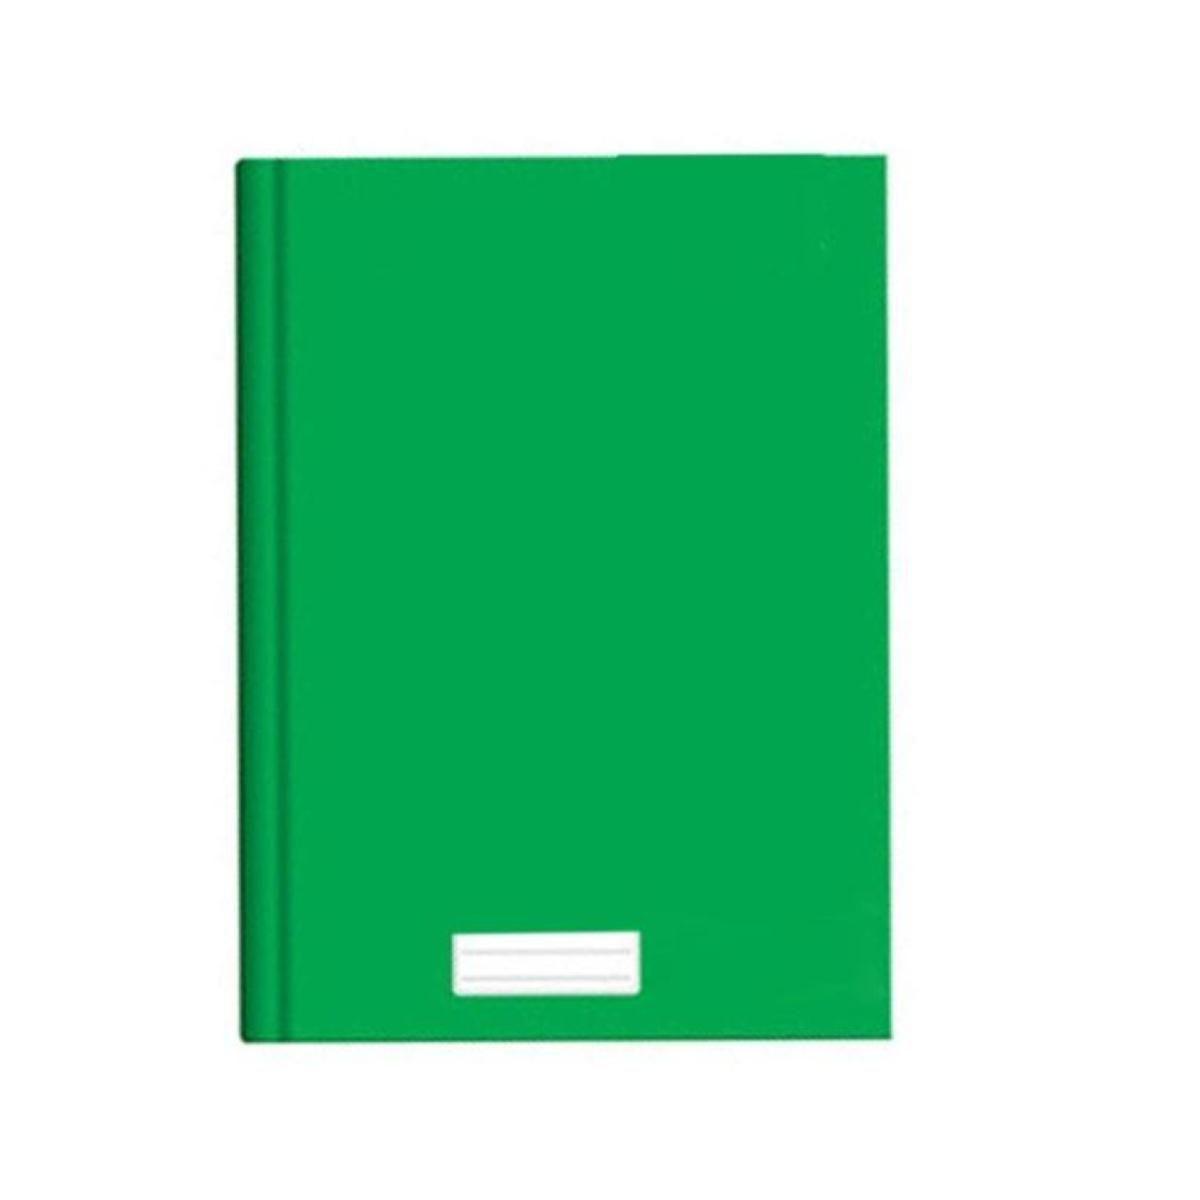 Caderno 1/4 Capa Dura 48 Folhas Panamericana